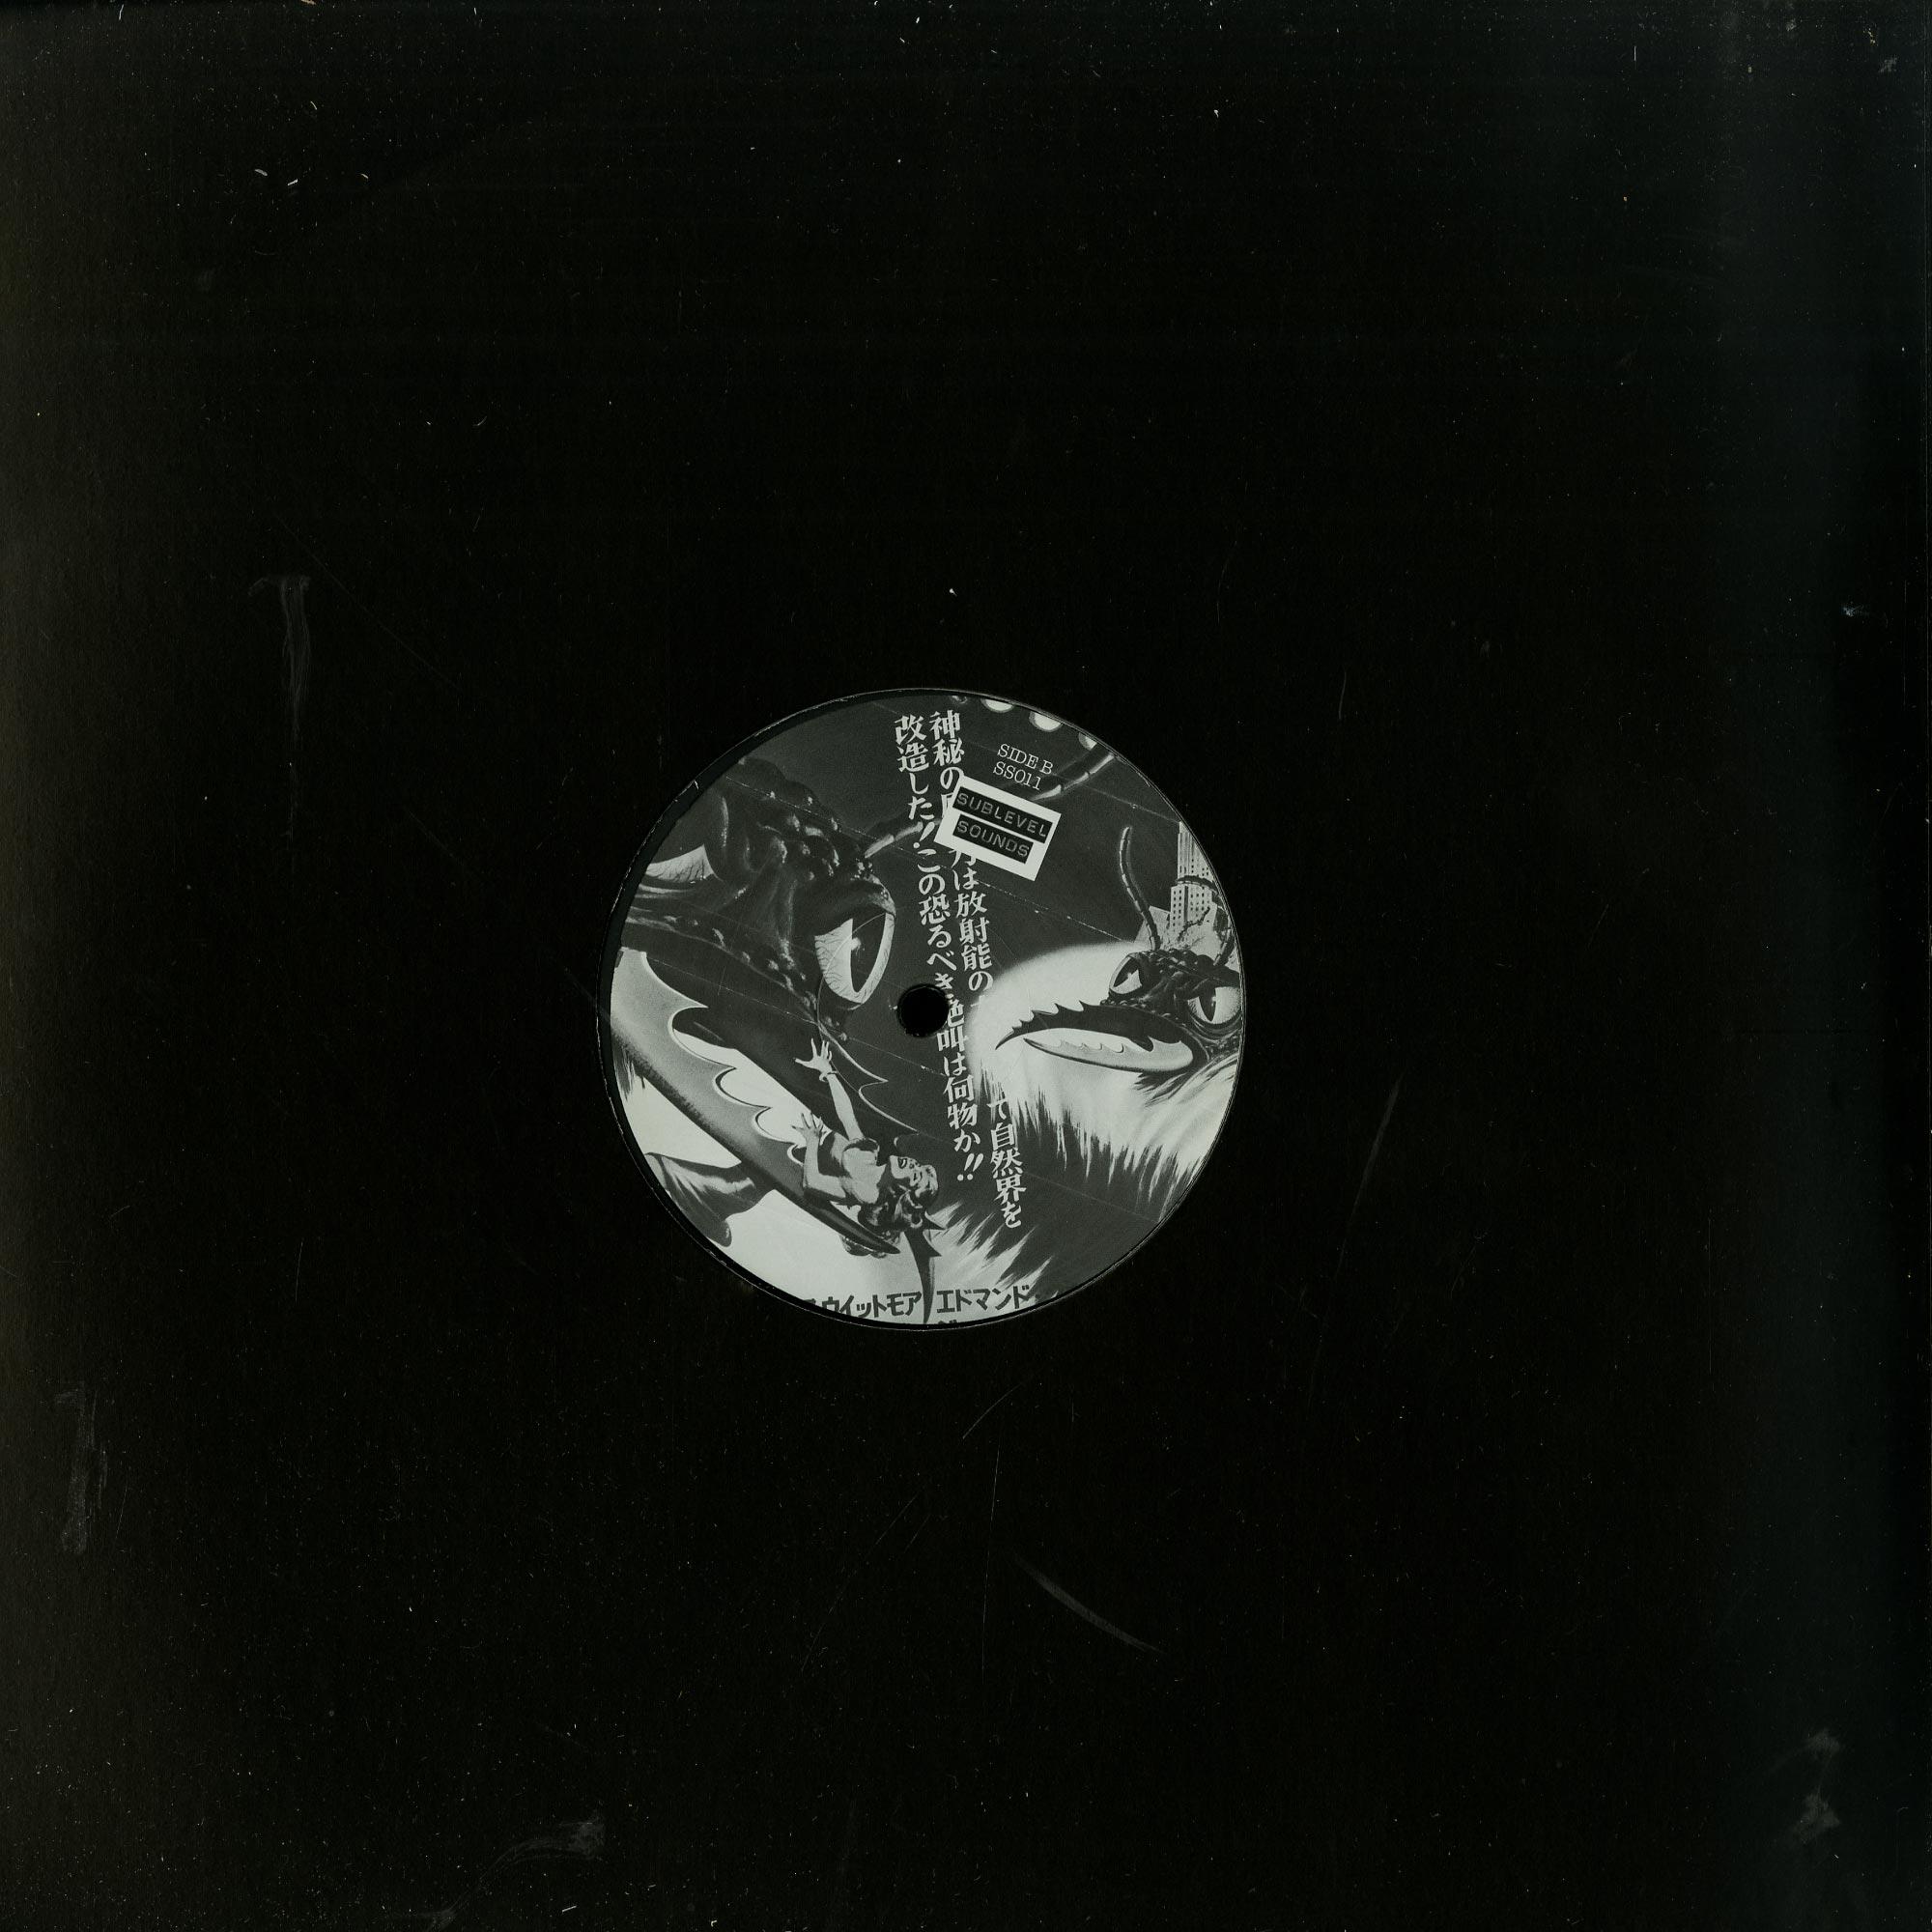 DJ Spider & Phil Moffa - PSYCHIC SURGEONS